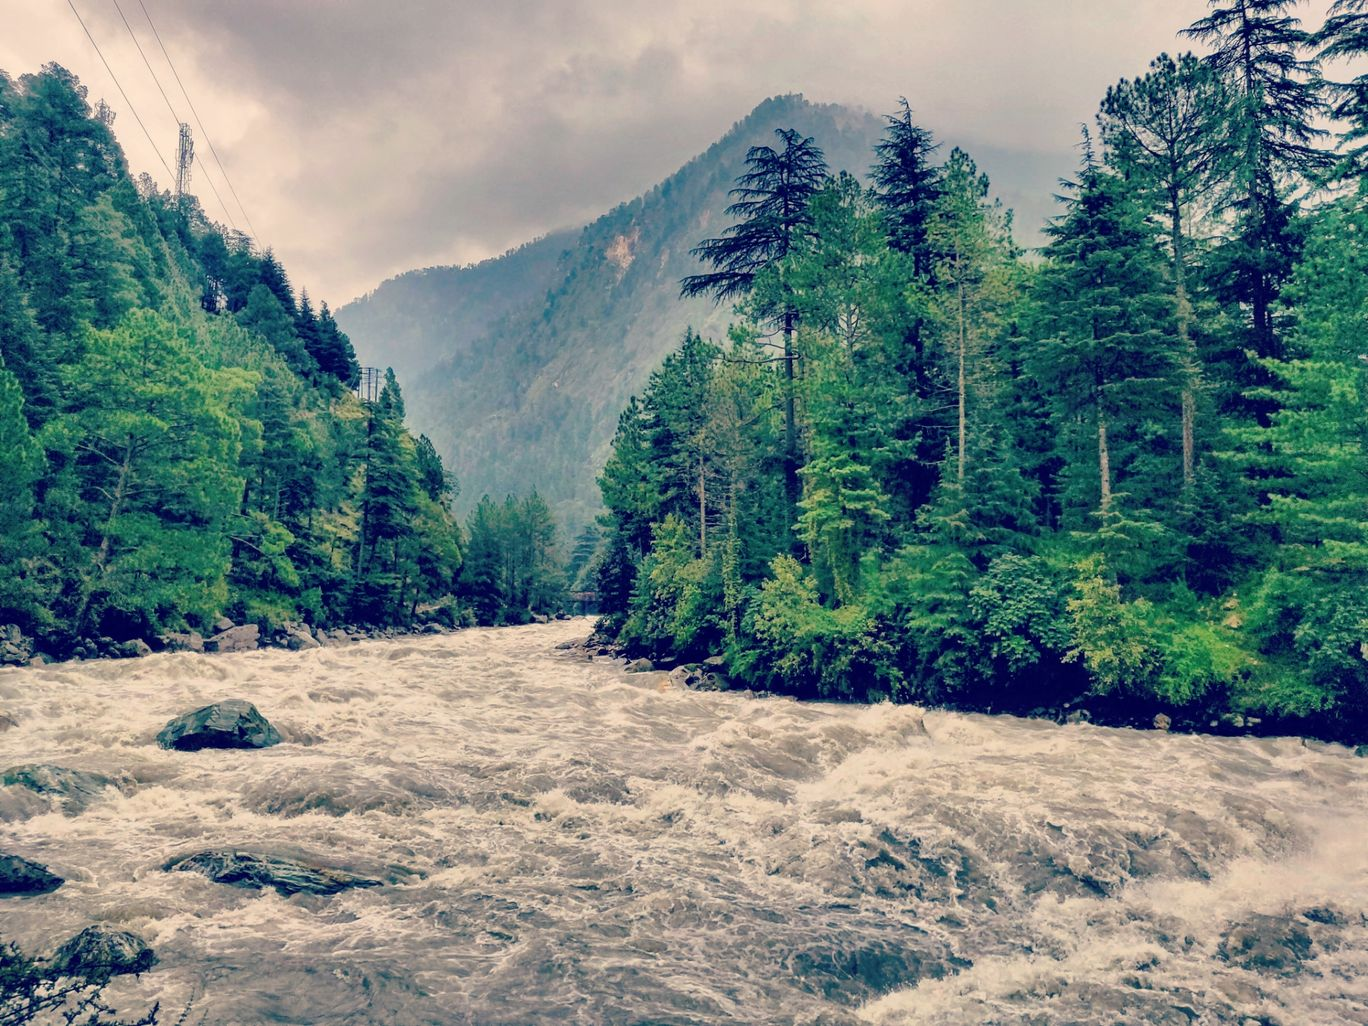 Photo of Parvati Valley By Sakshi Chauhan